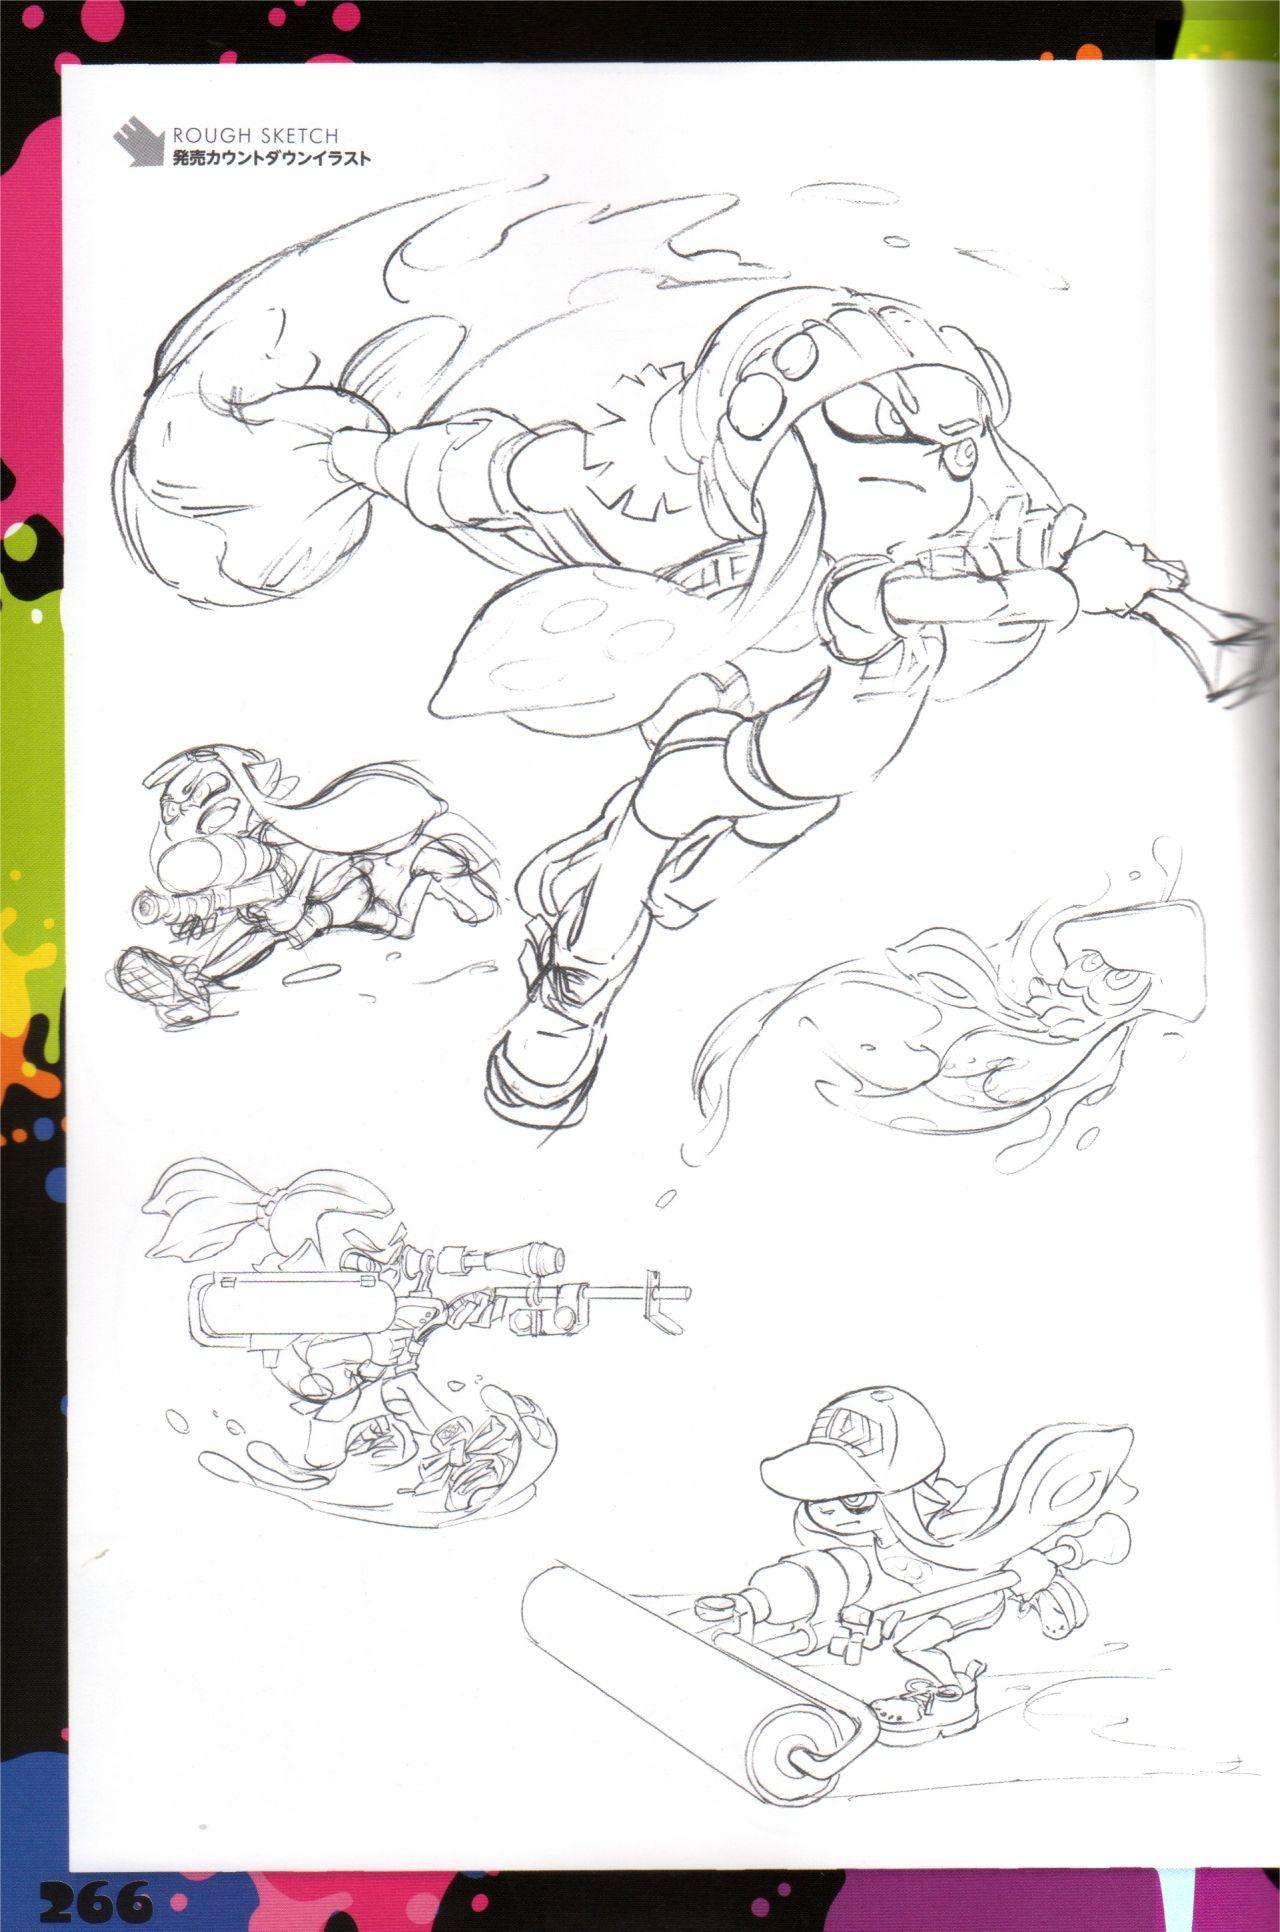 Luxe Dessin A Colorier De Manga